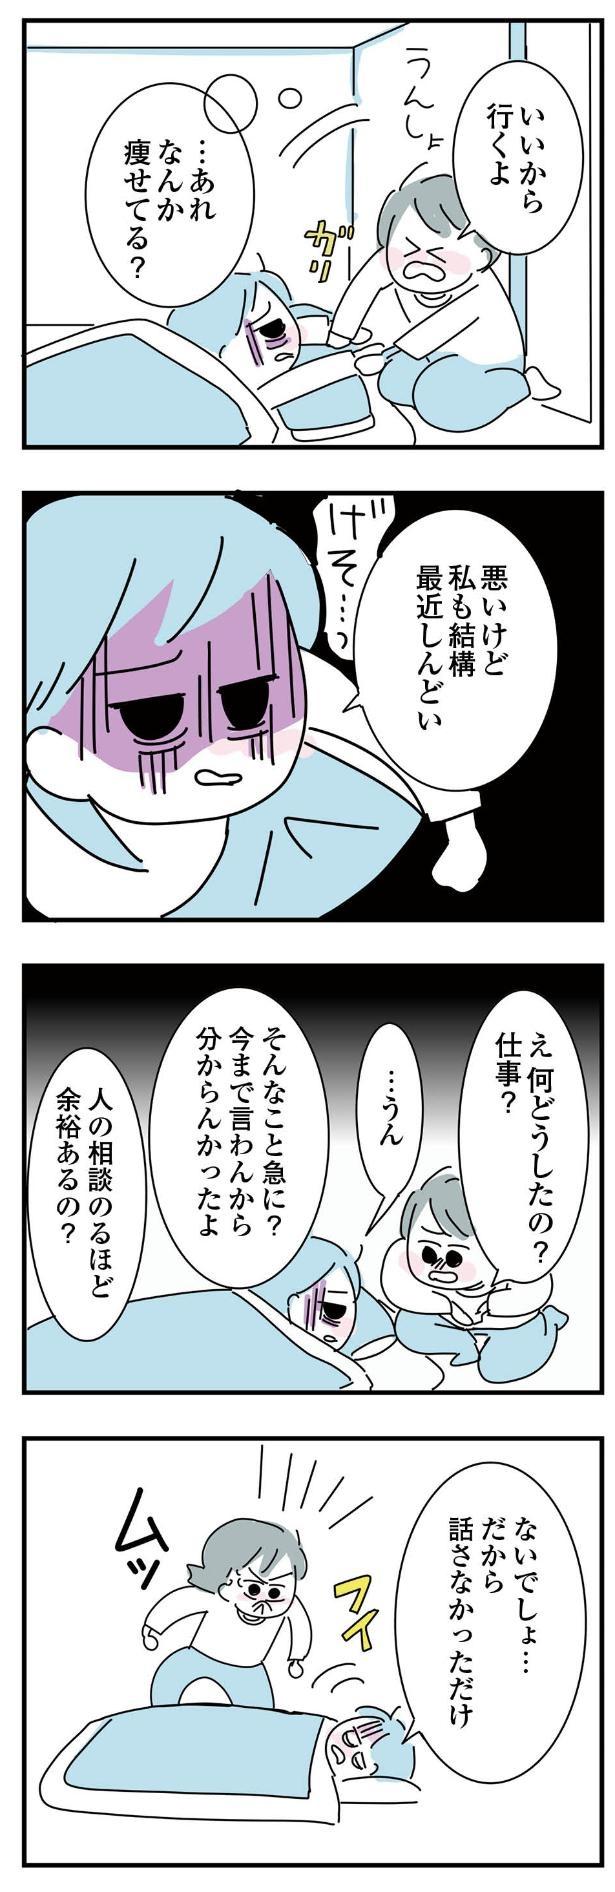 12/14